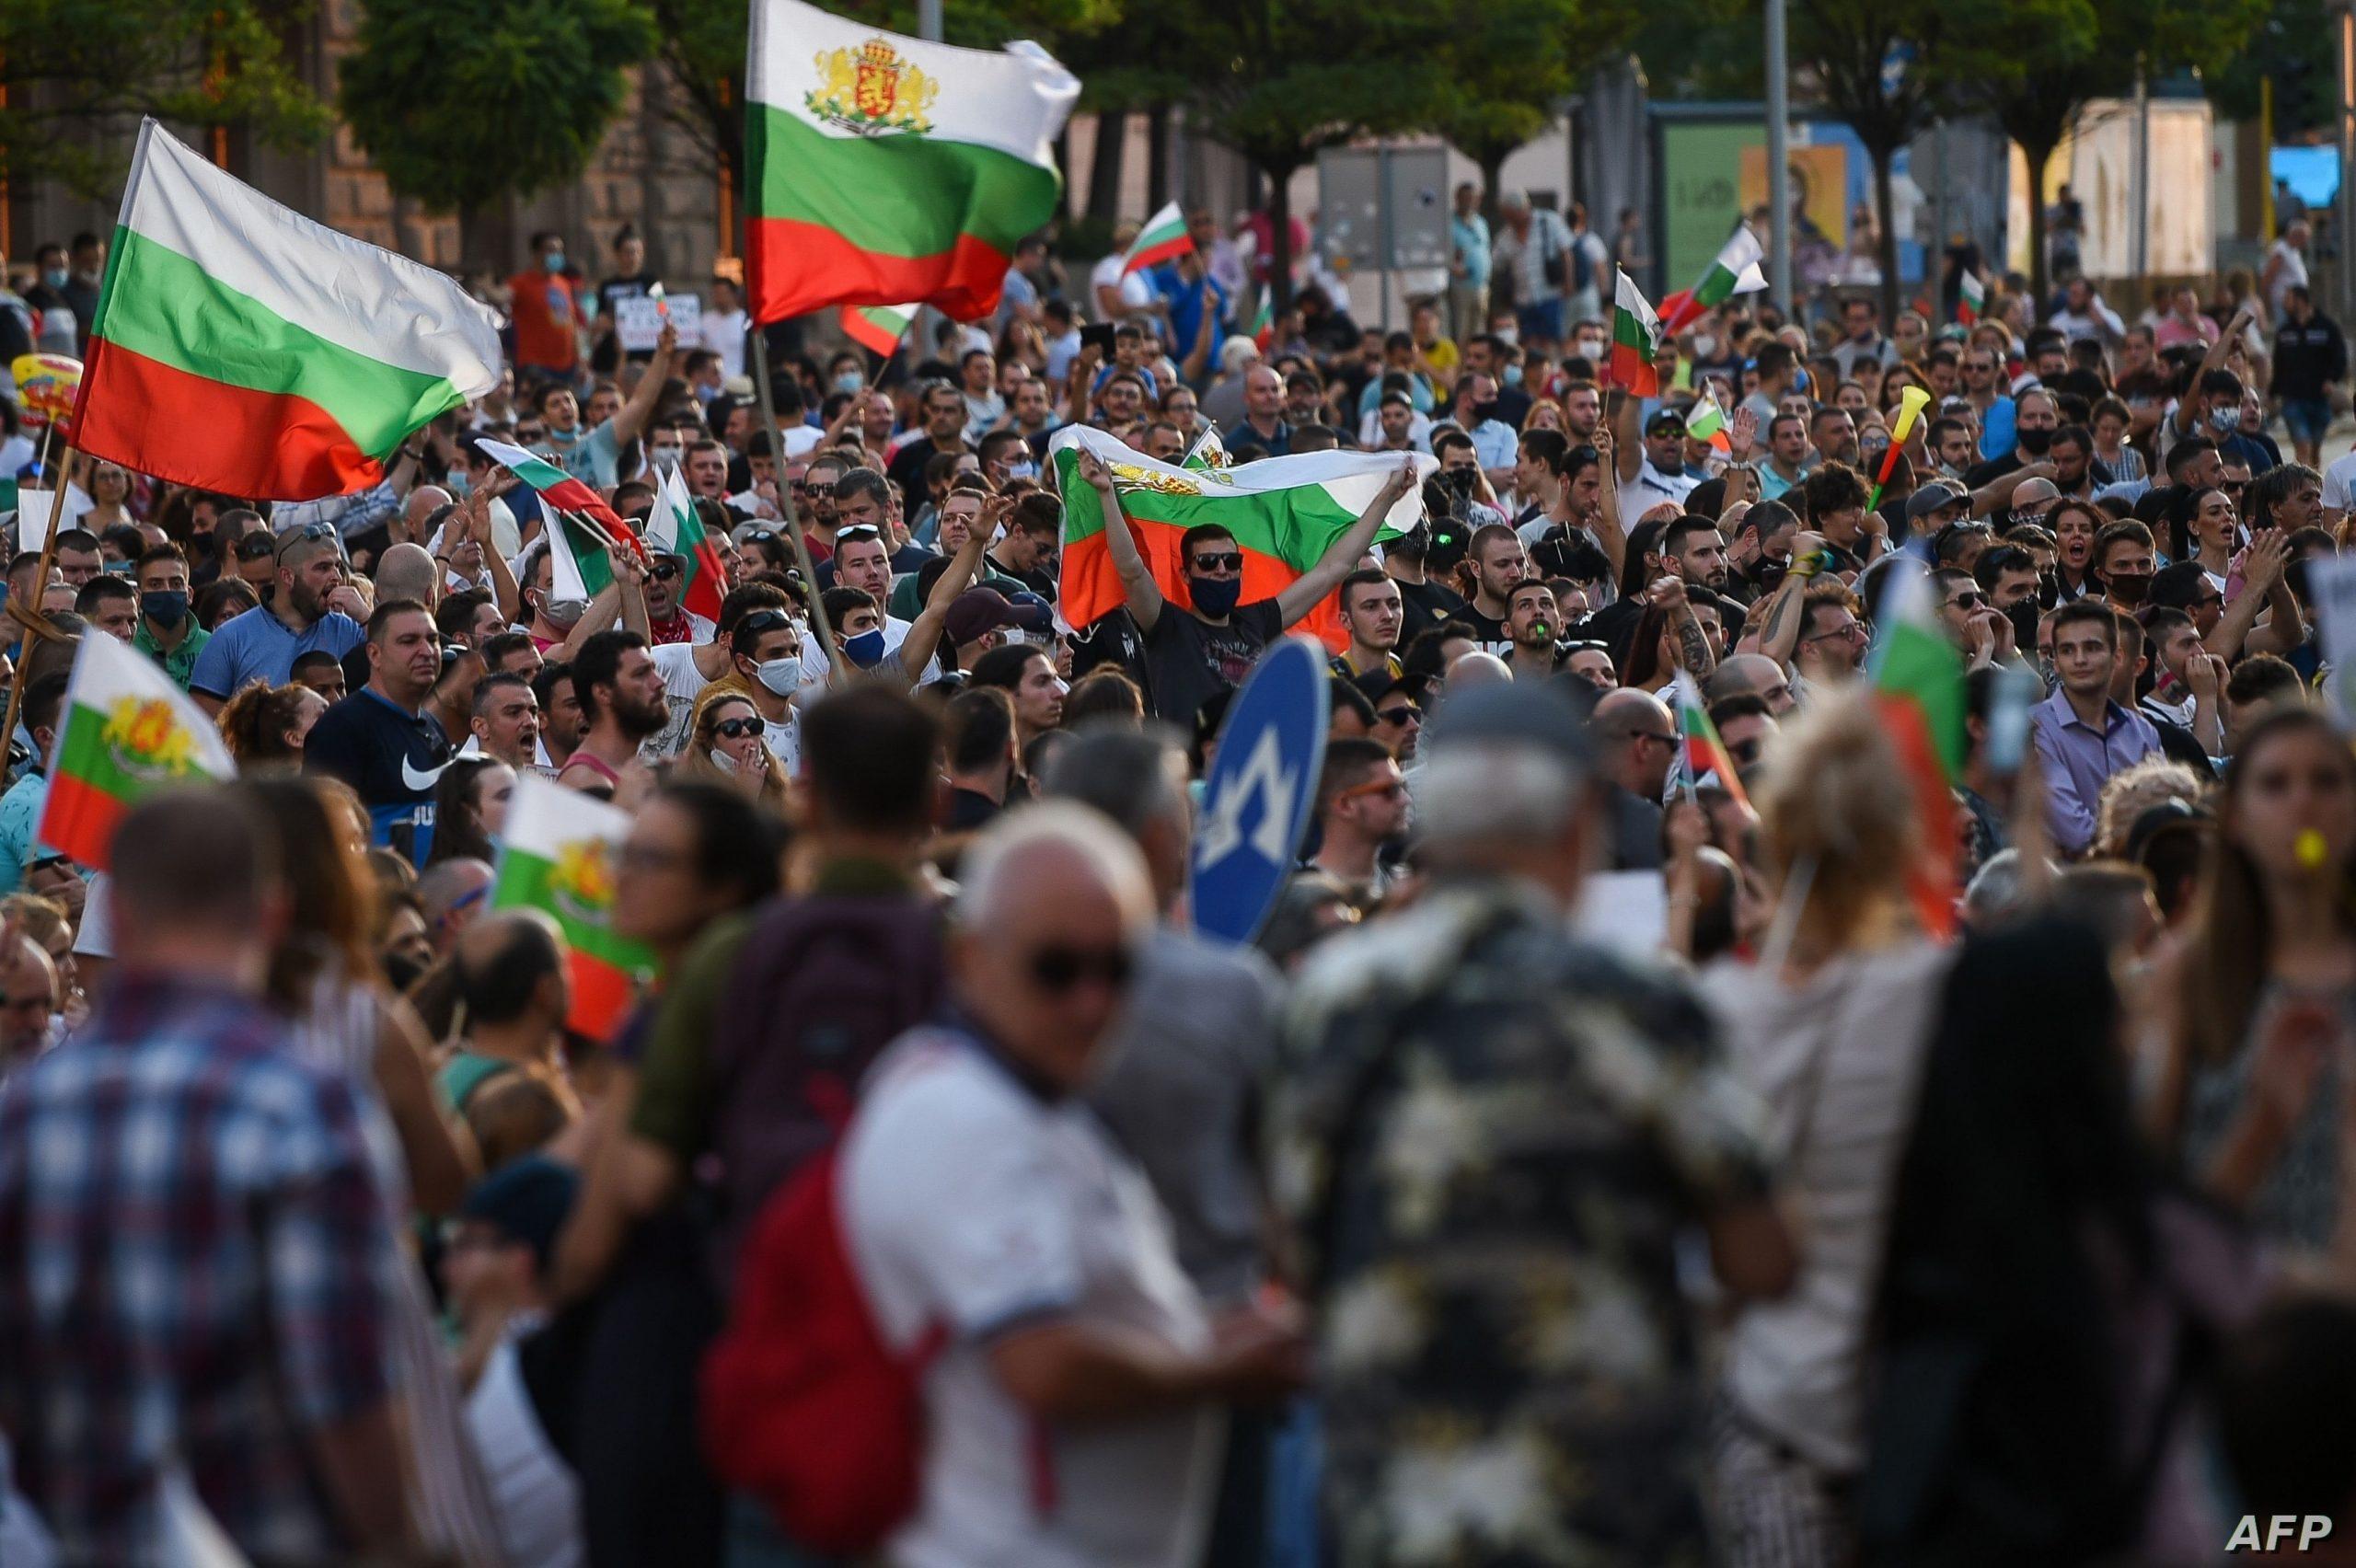 Corruption in Bulgaria